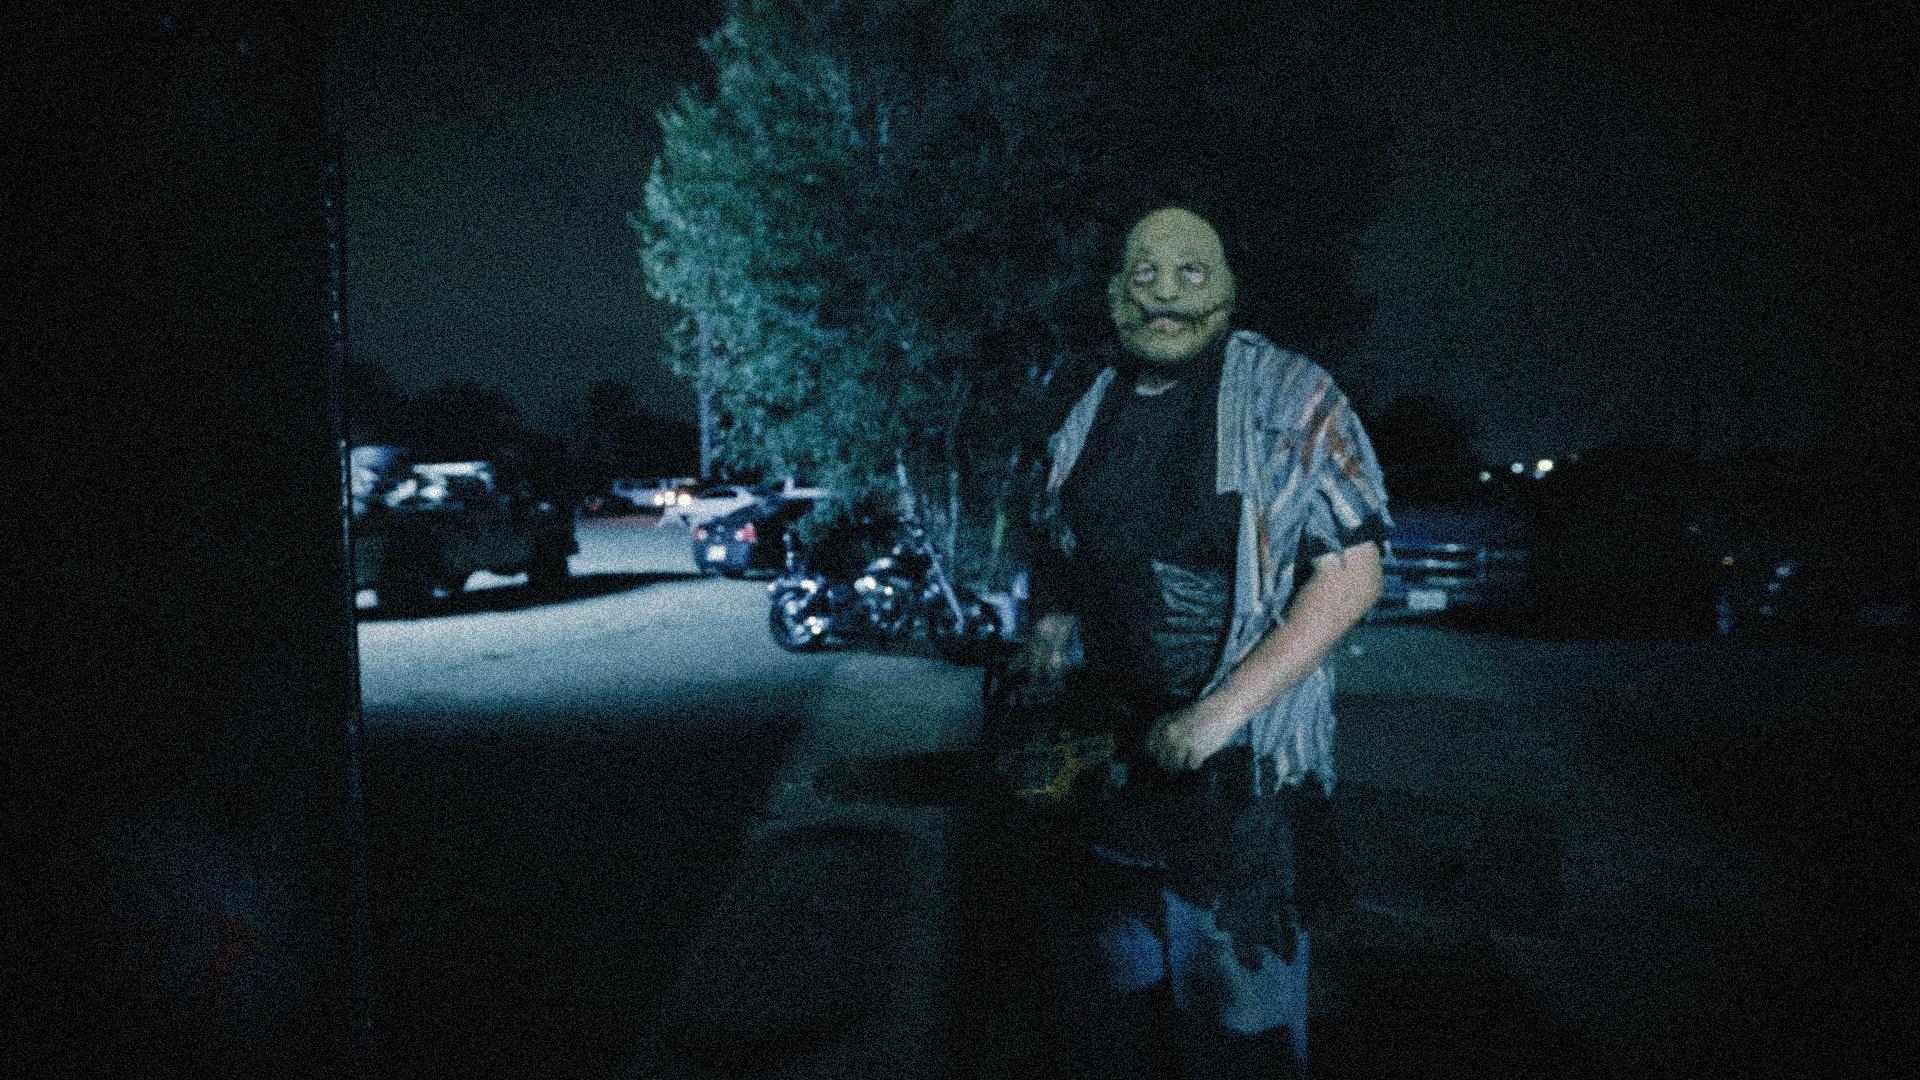 Best Little Horror House in Texas